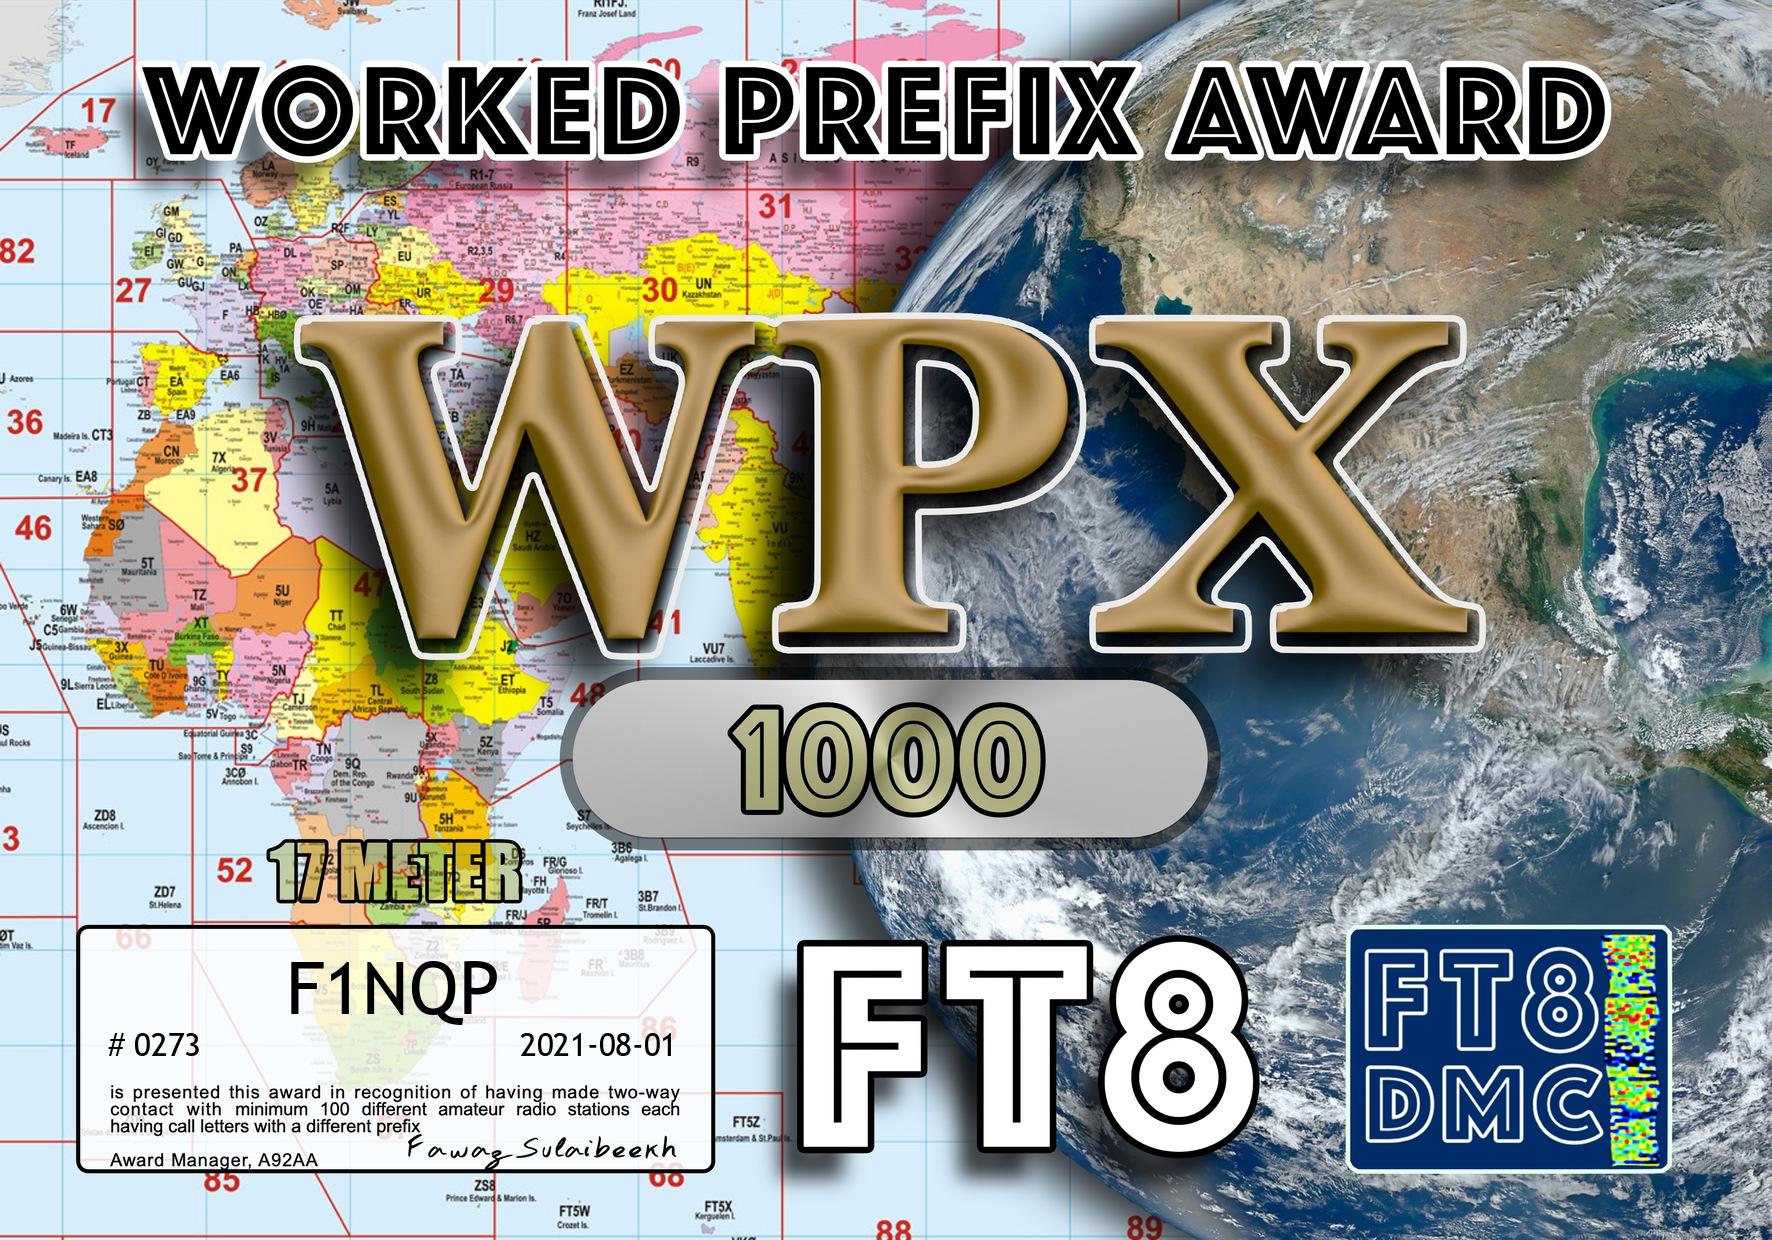 F1NQP-WPX17-1000_FT8DMC.jpg